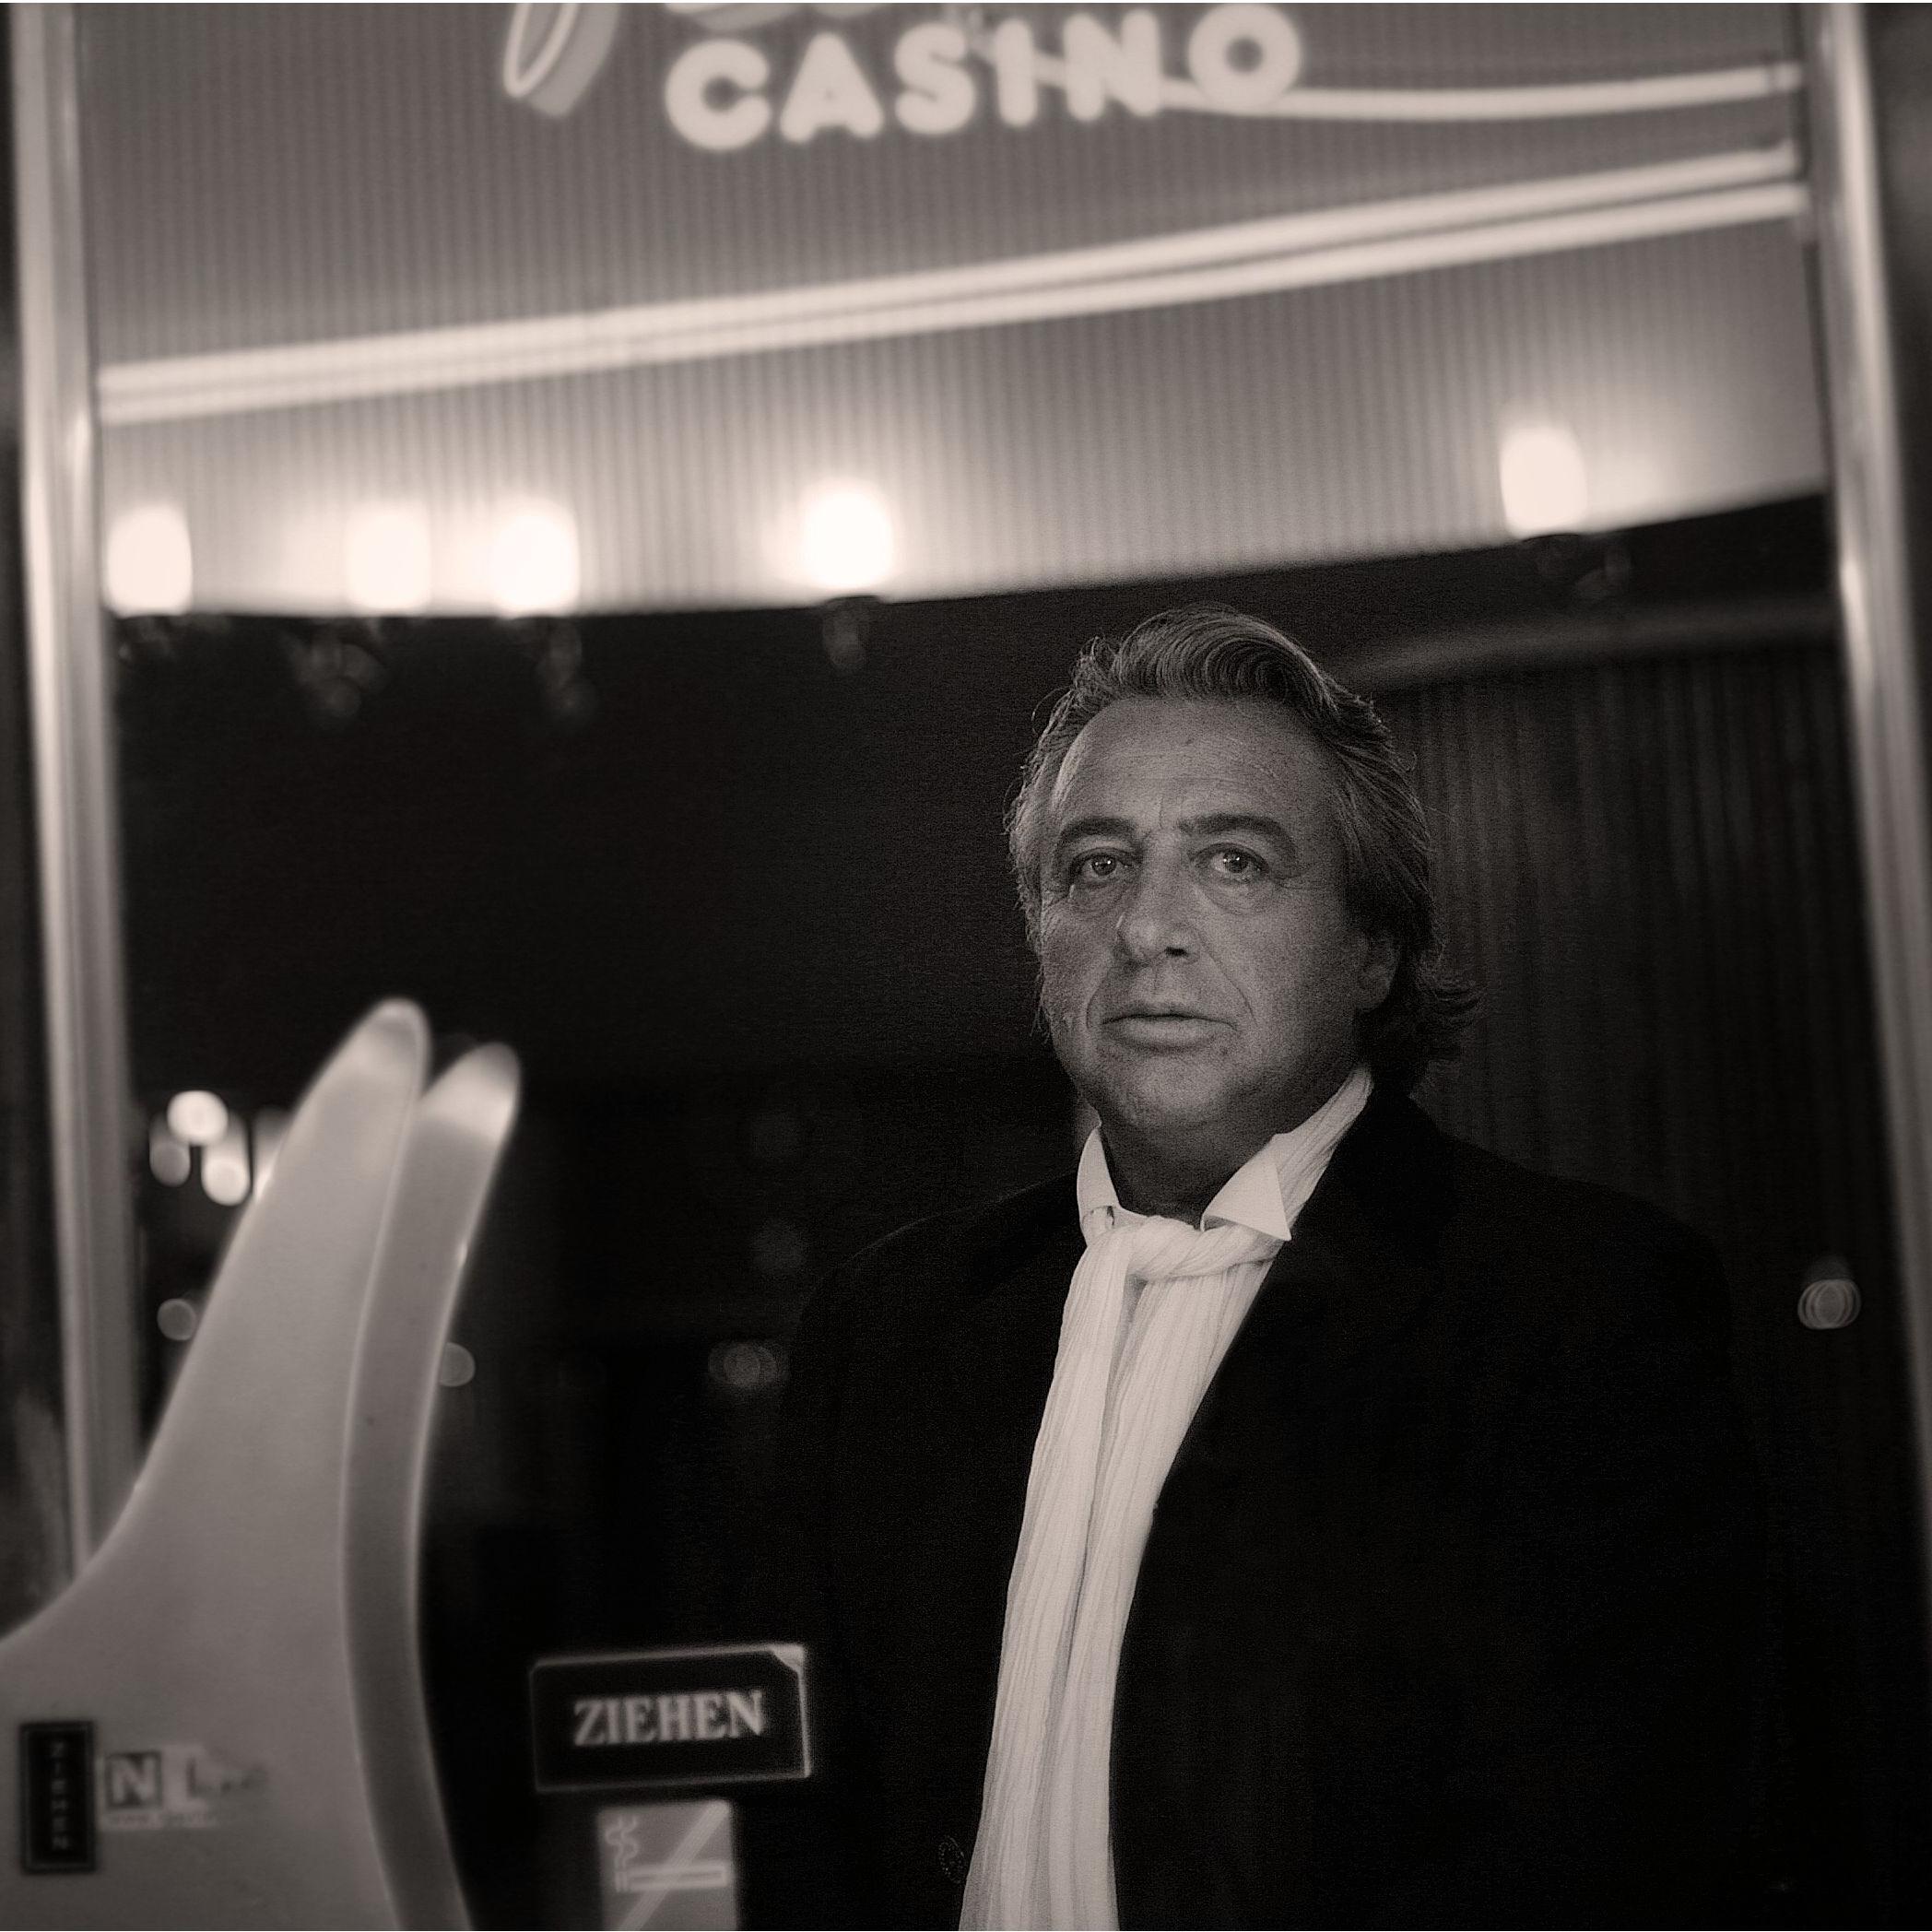 Pascha Poker Salzburg geschlossen - Ein heiterer Nachruf